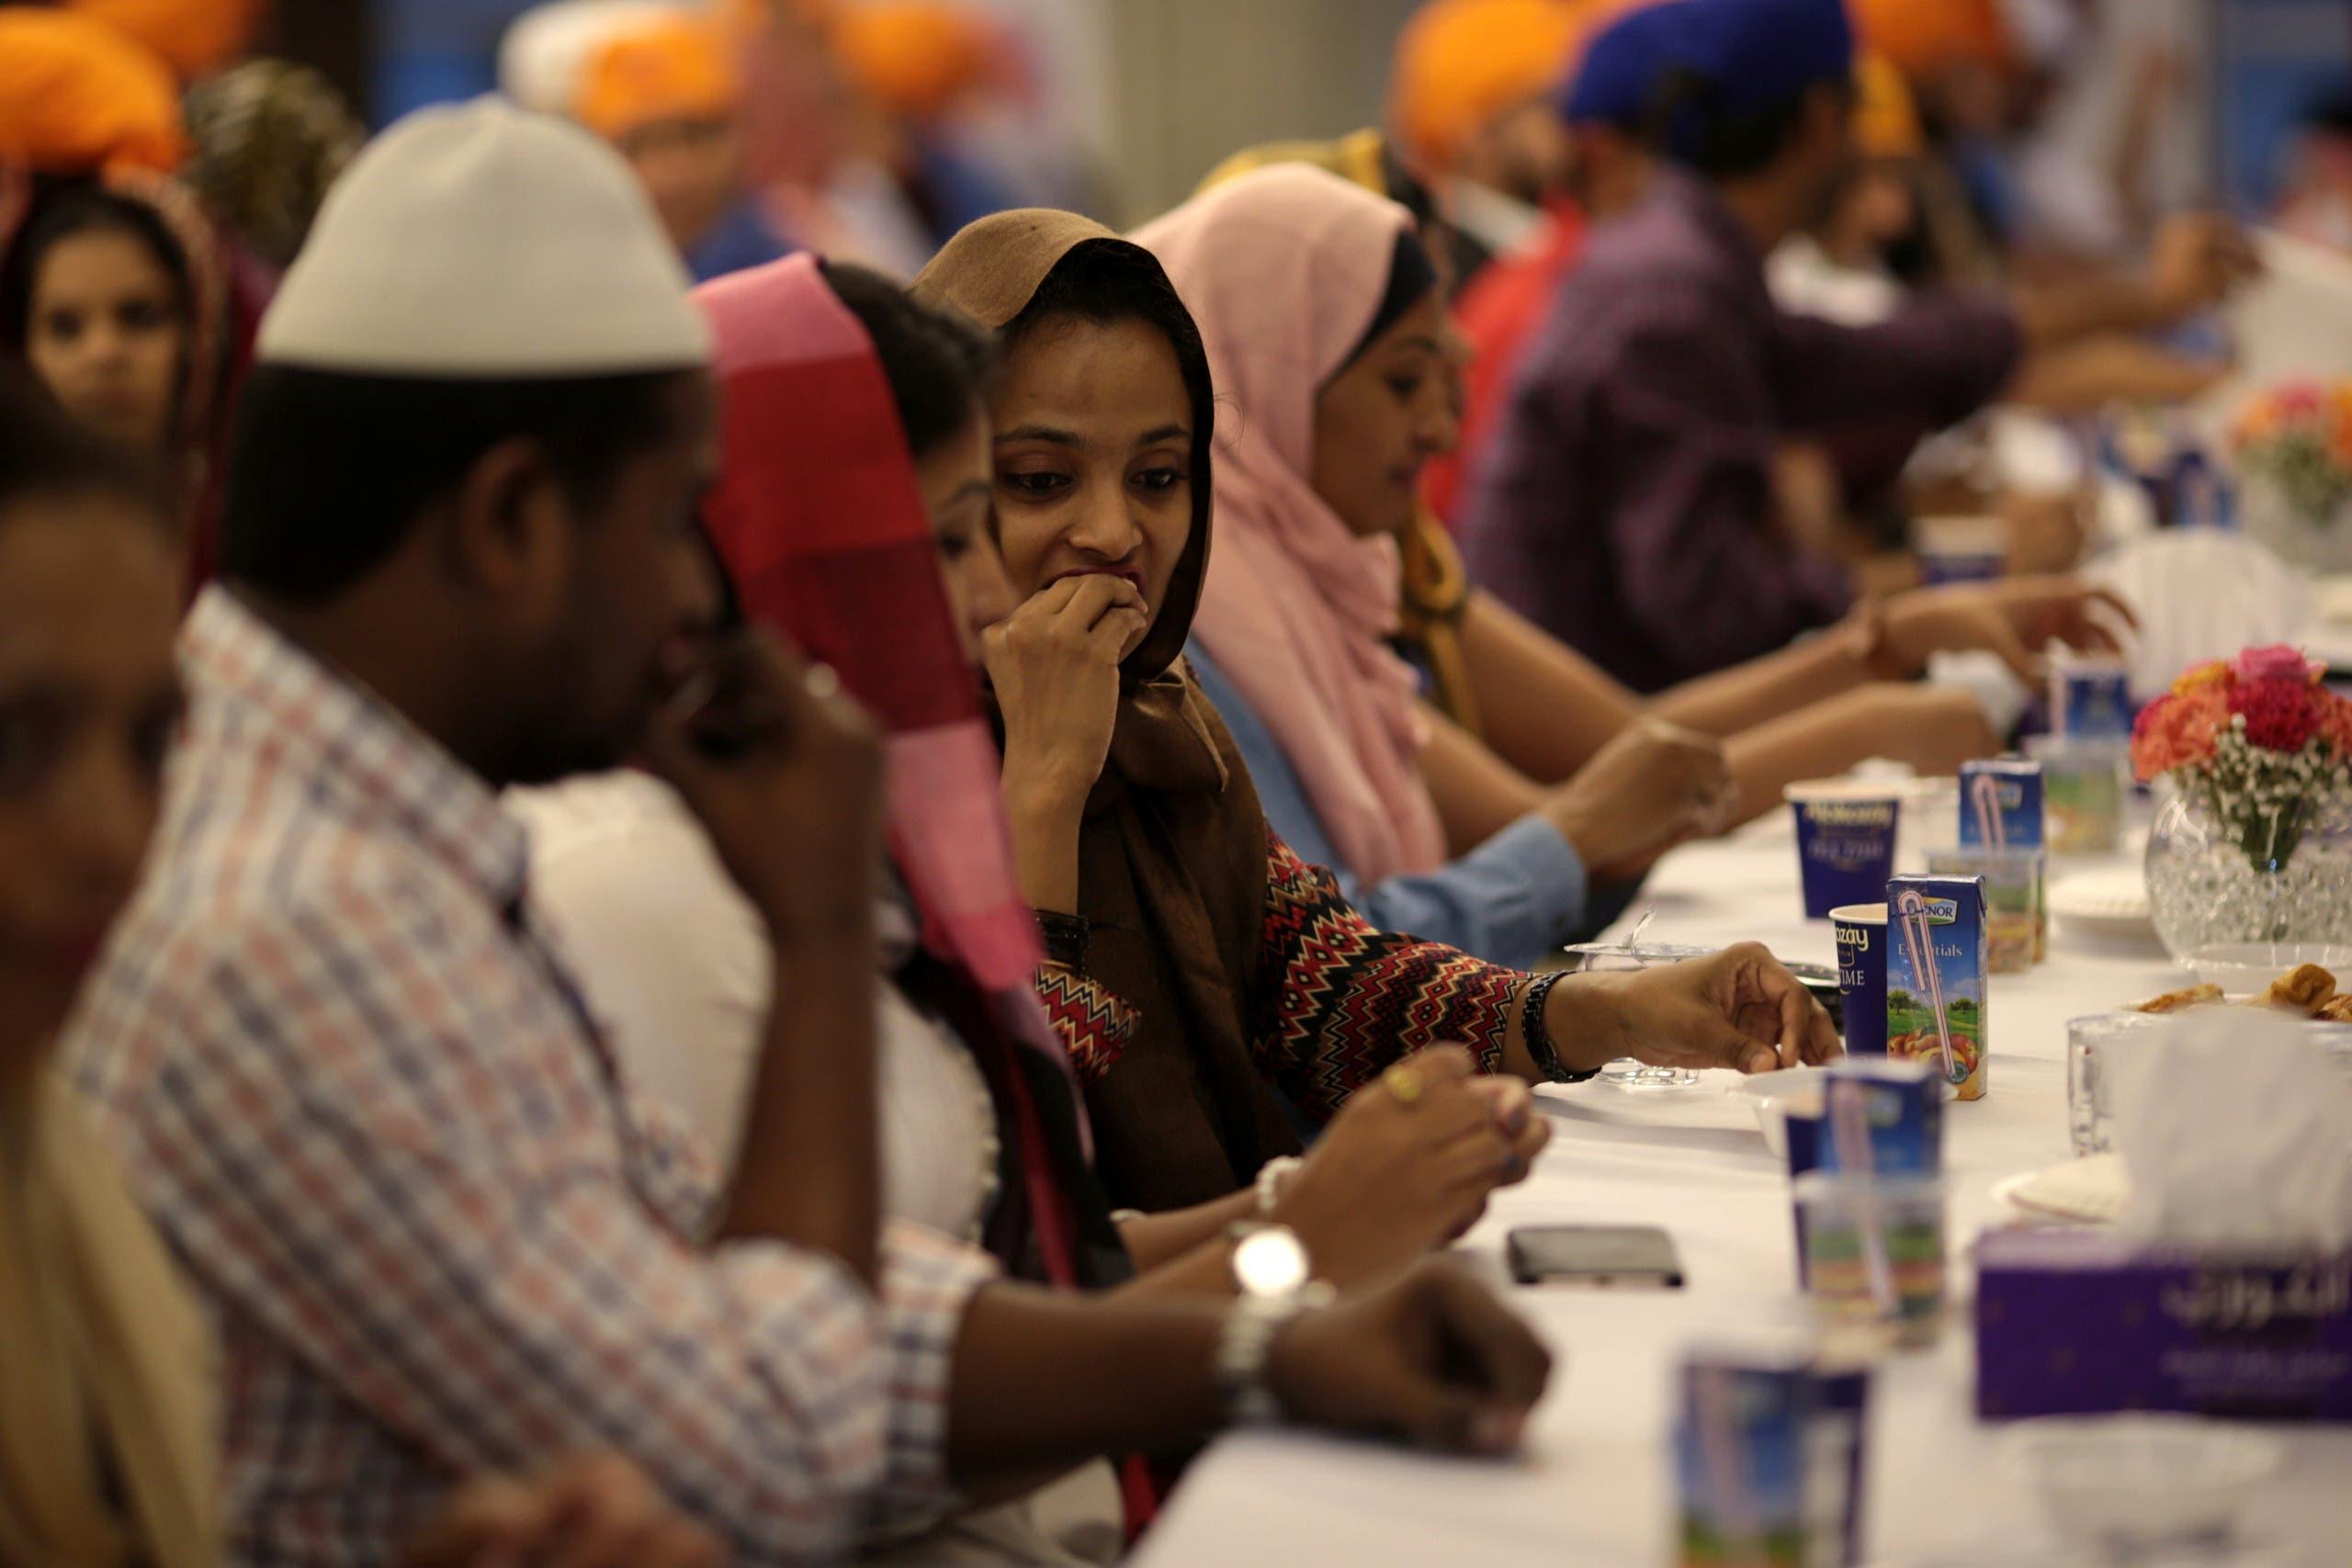 Muslims break their fast at the GuruNanak Darbar Sikh temple, during the Muslim holy month of Ramadan in Dubai. (File photo: Reuters)